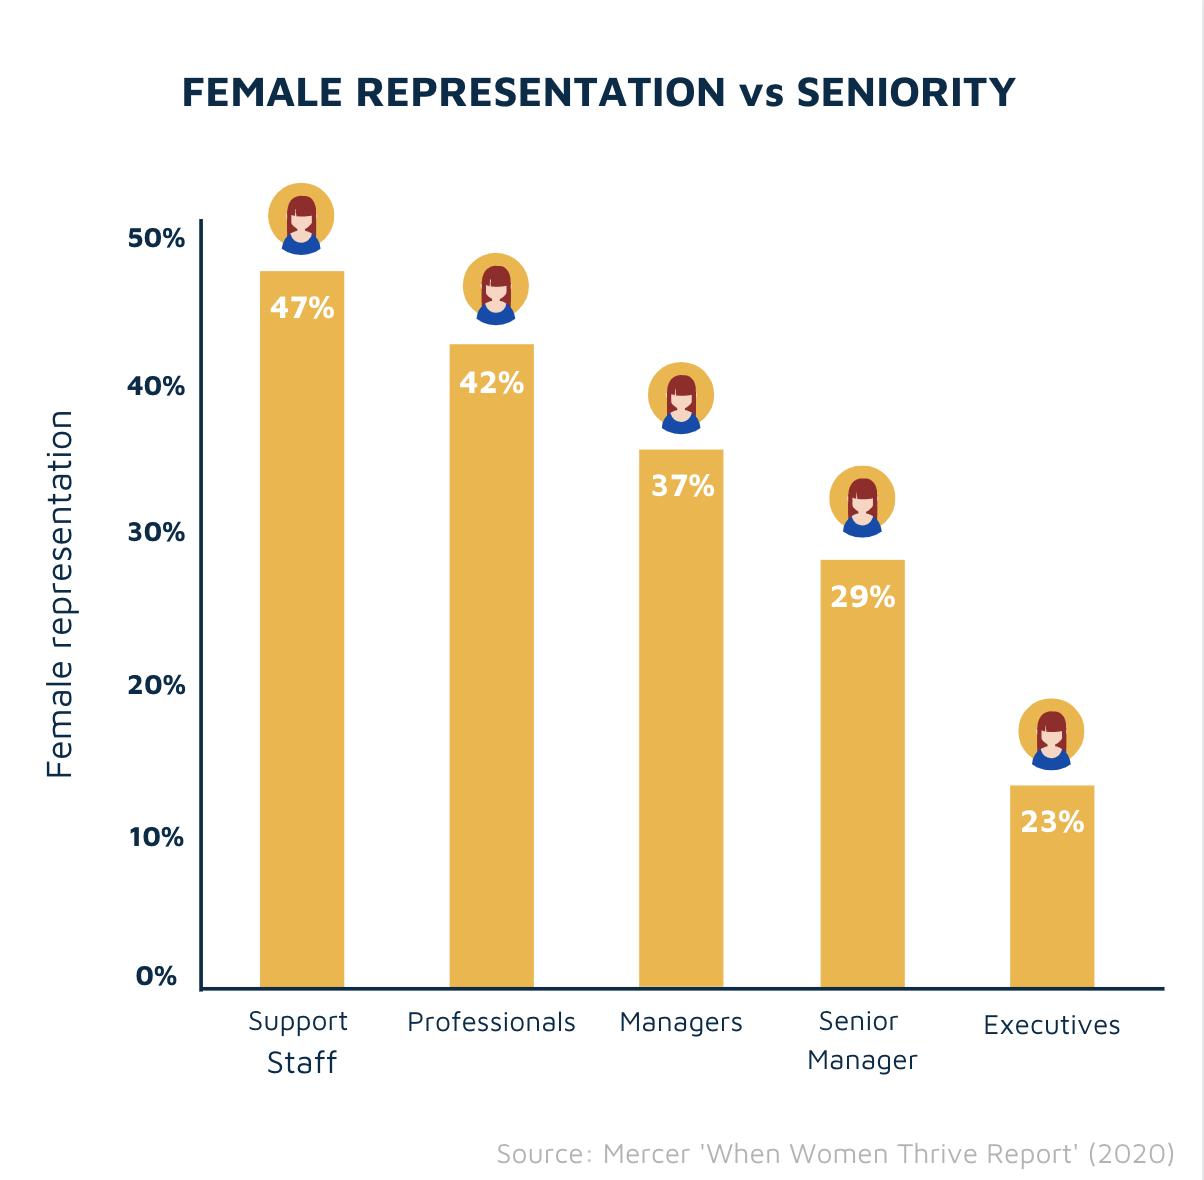 Female representation vs seniority